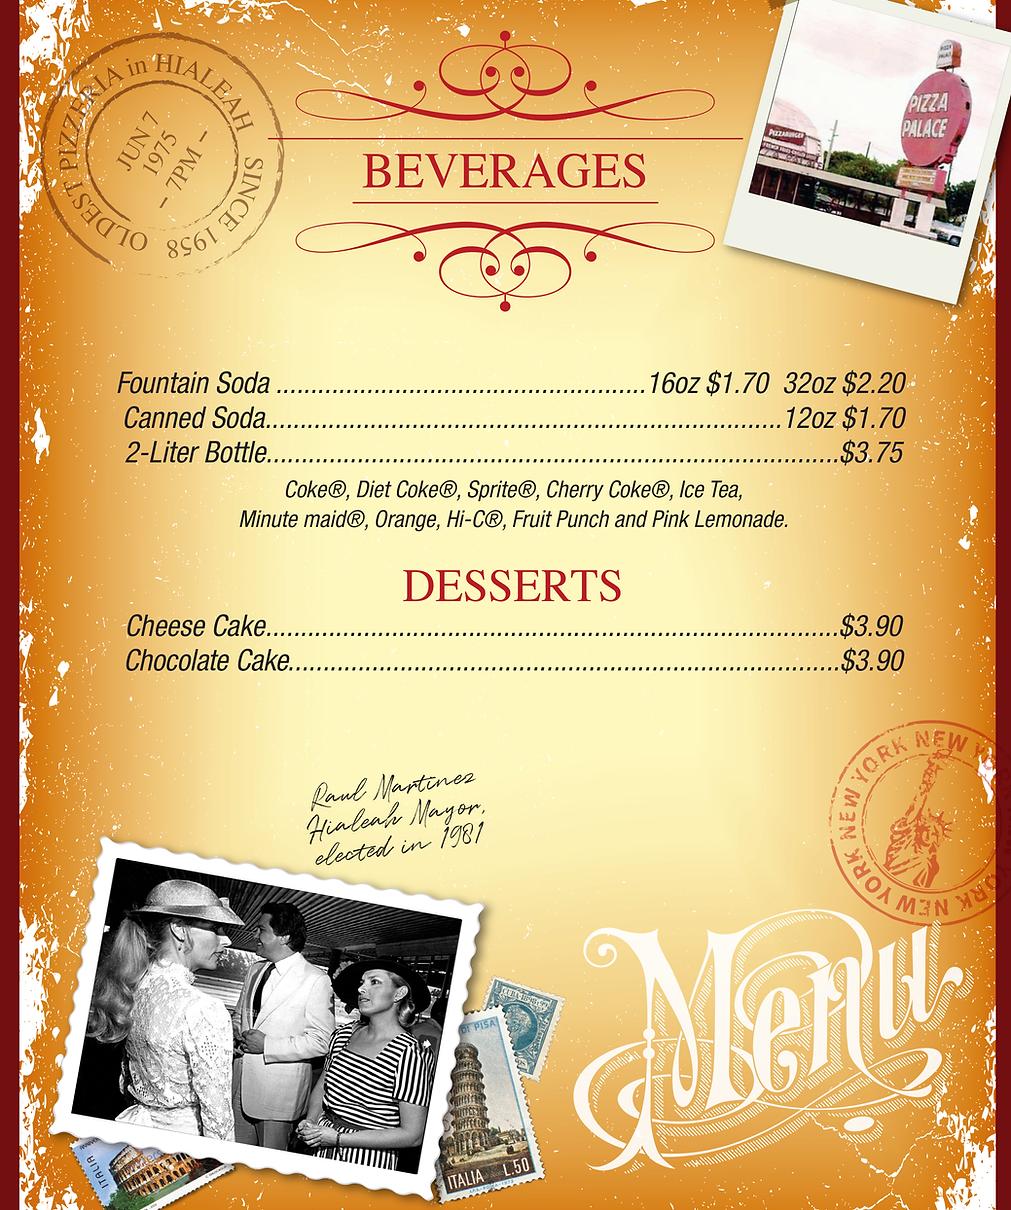 J&J Pizza Web Menu Beverage & Desserts.png